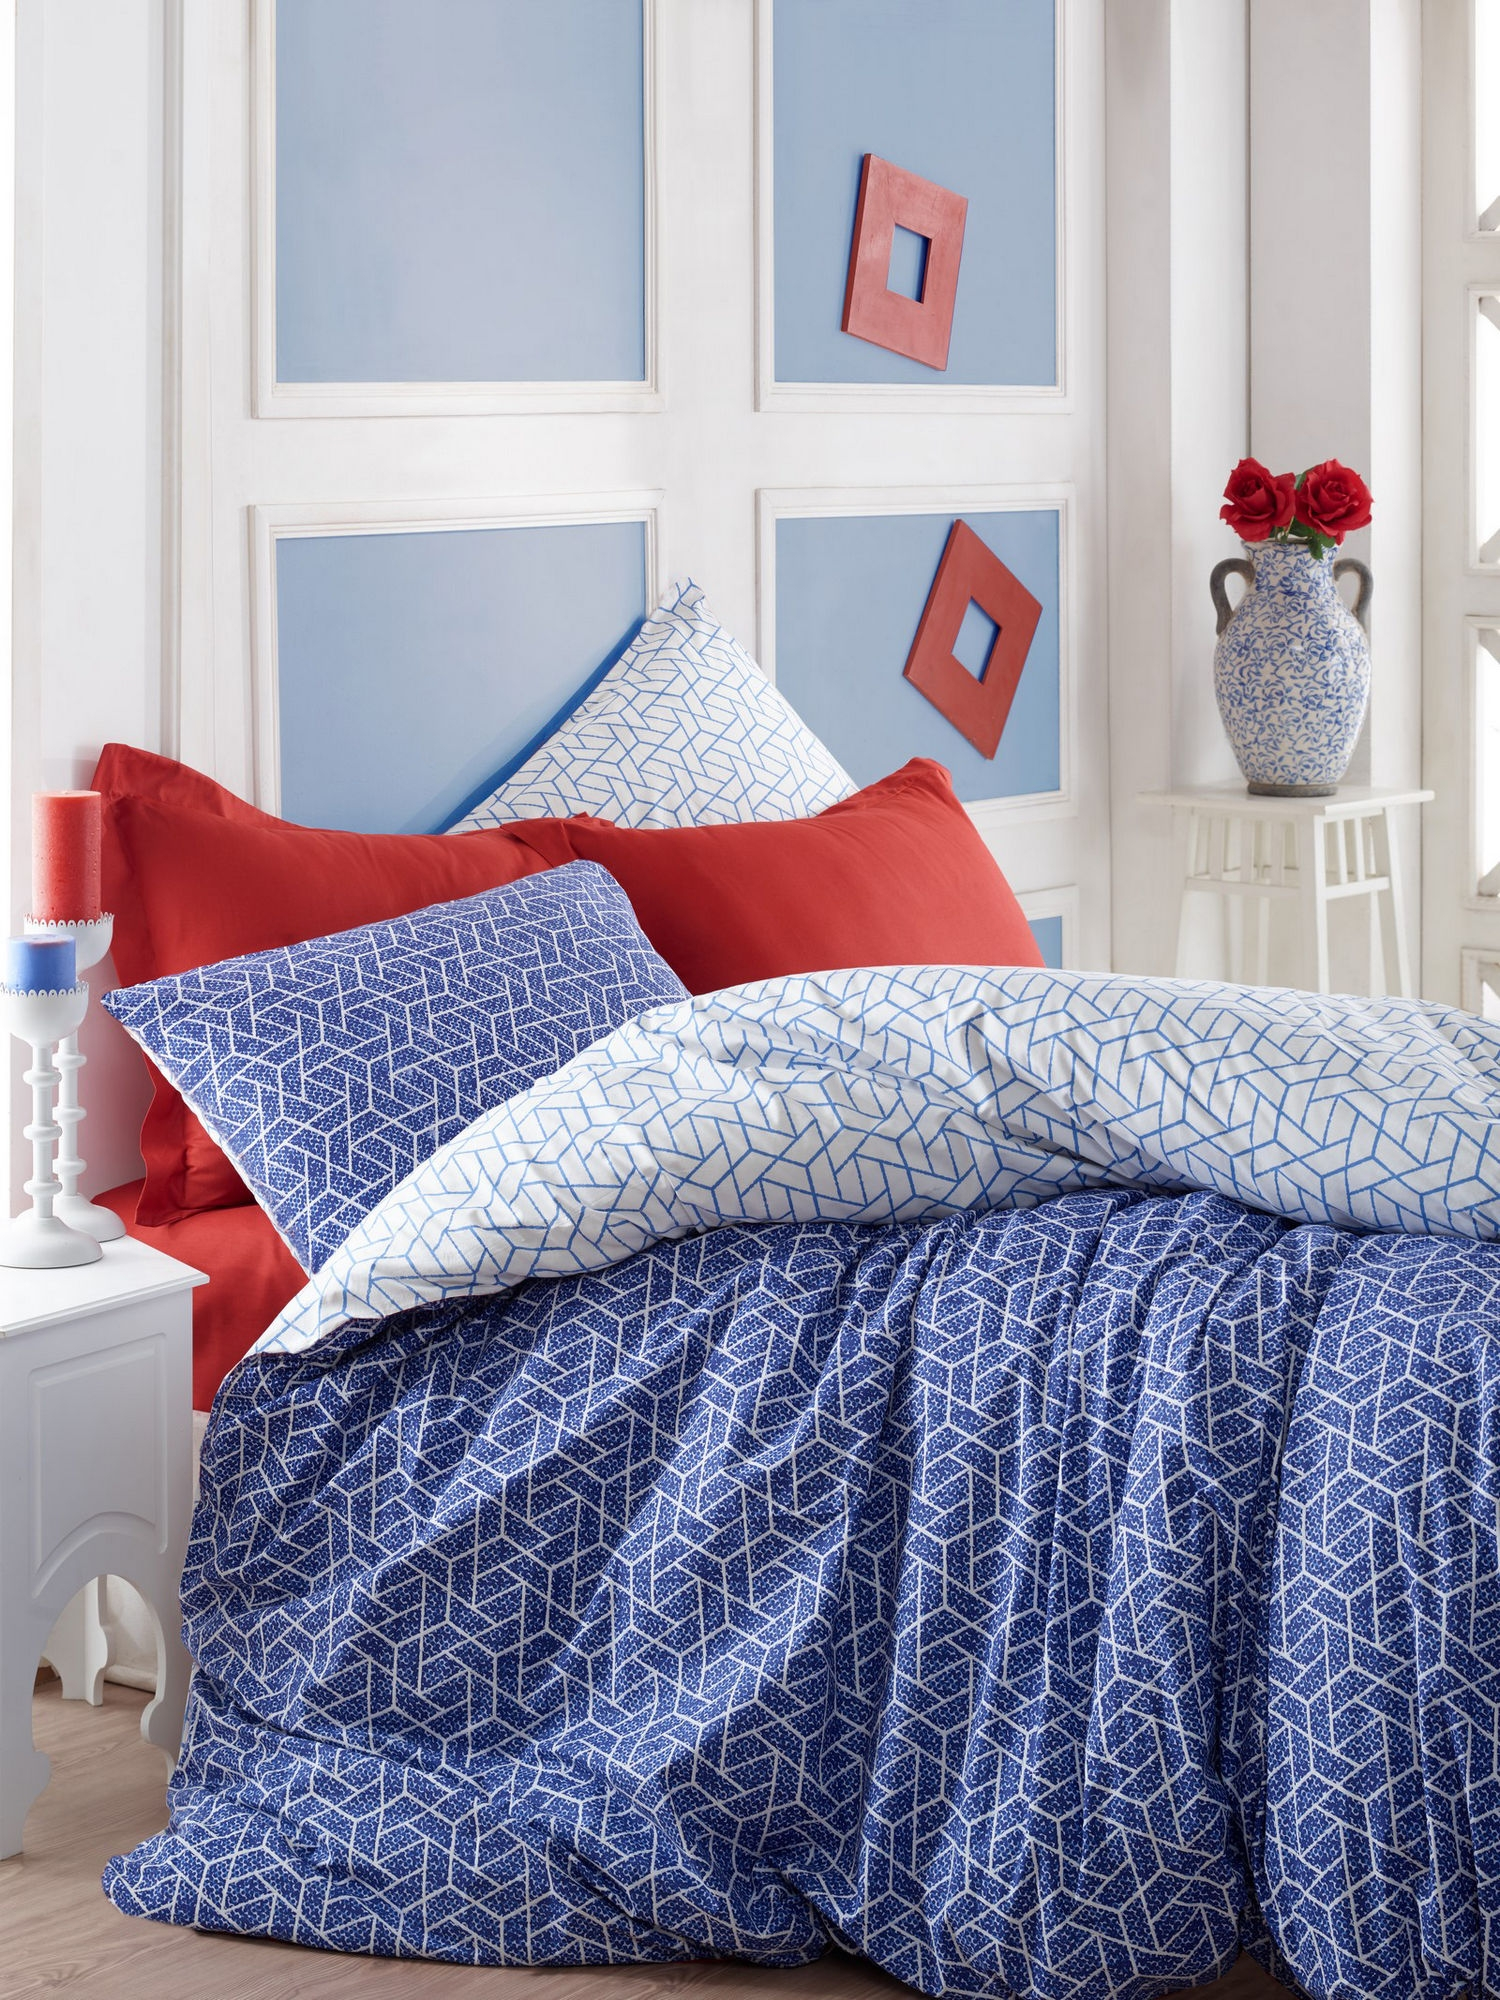 Lenjerie de pat din bumbac Ranforce Pave Bleumarin / Alb, 200 x 220 cm imagine